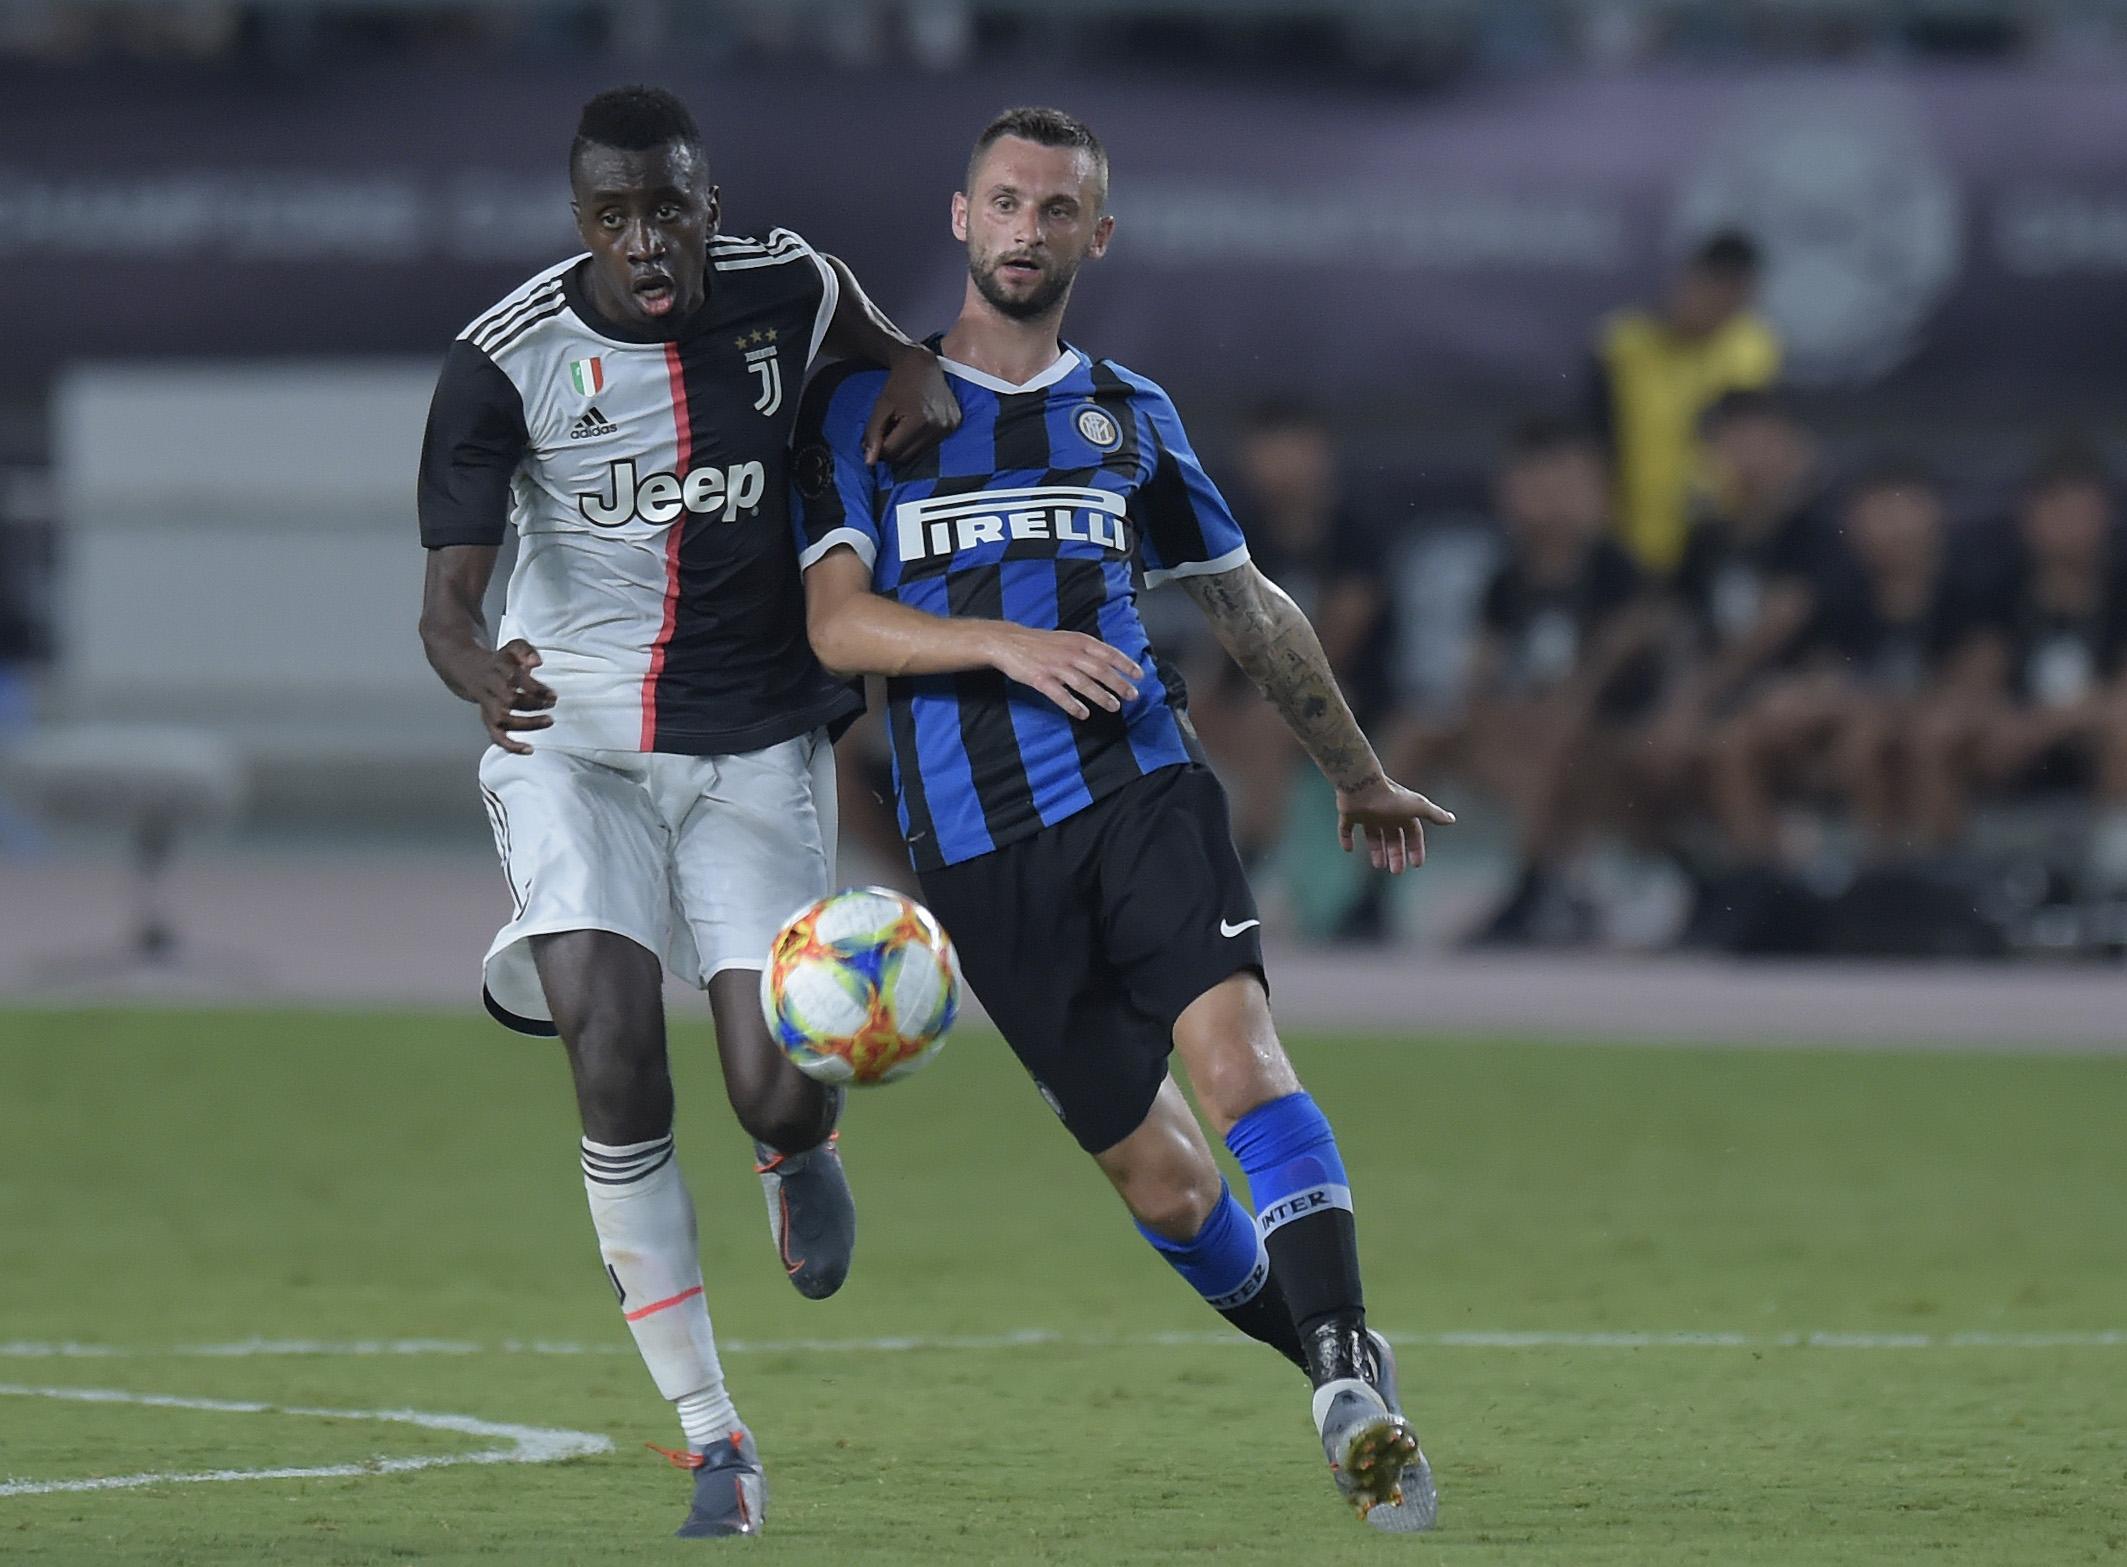 2019 International Champions Cup - Juventus v FC Internazionale